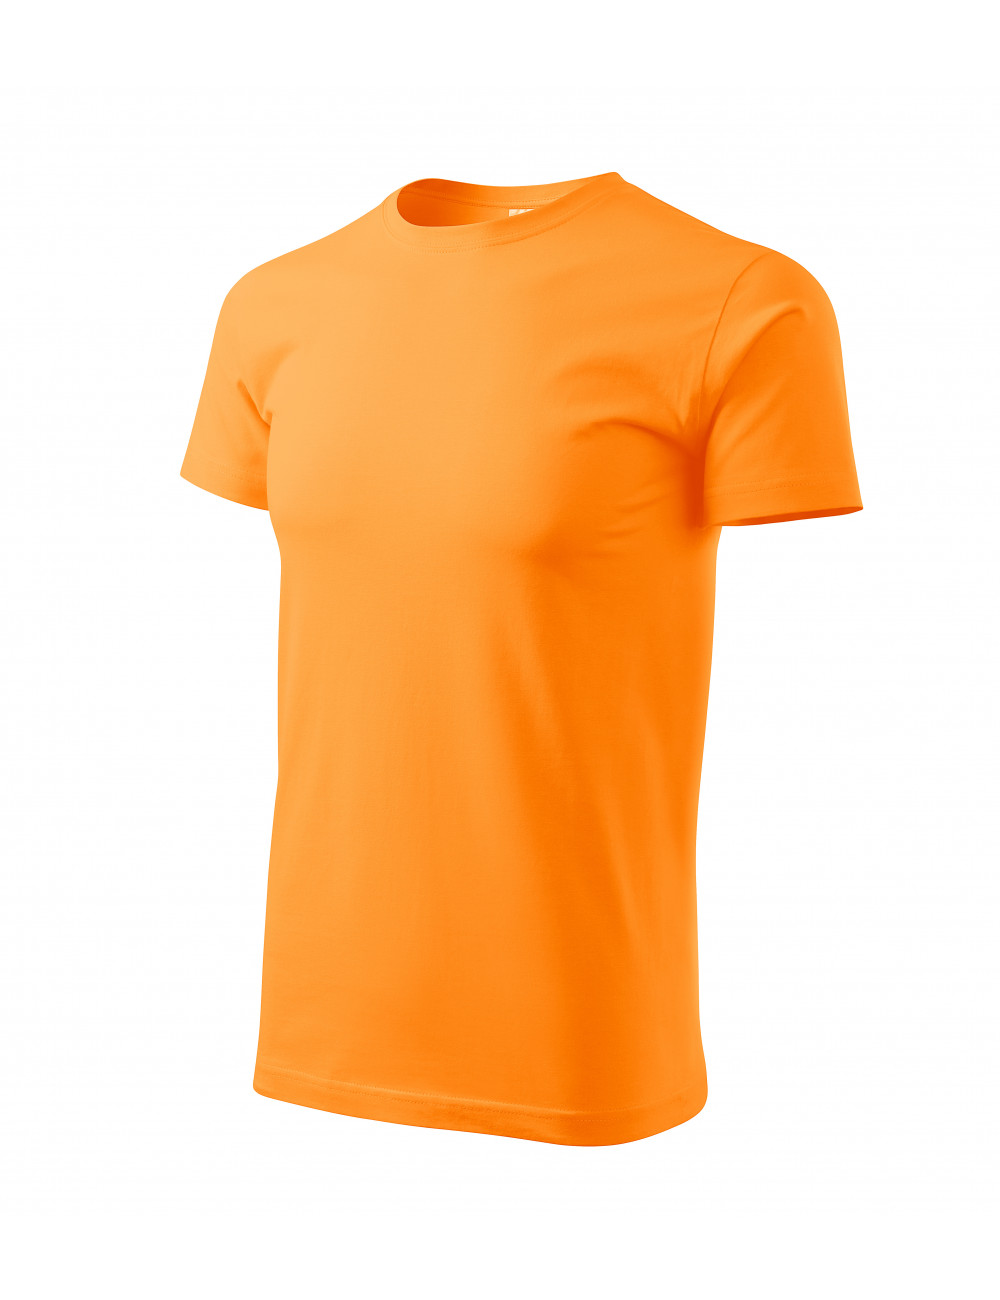 Adler MALFINI Koszulka unisex Heavy New 137 mandarynkowy